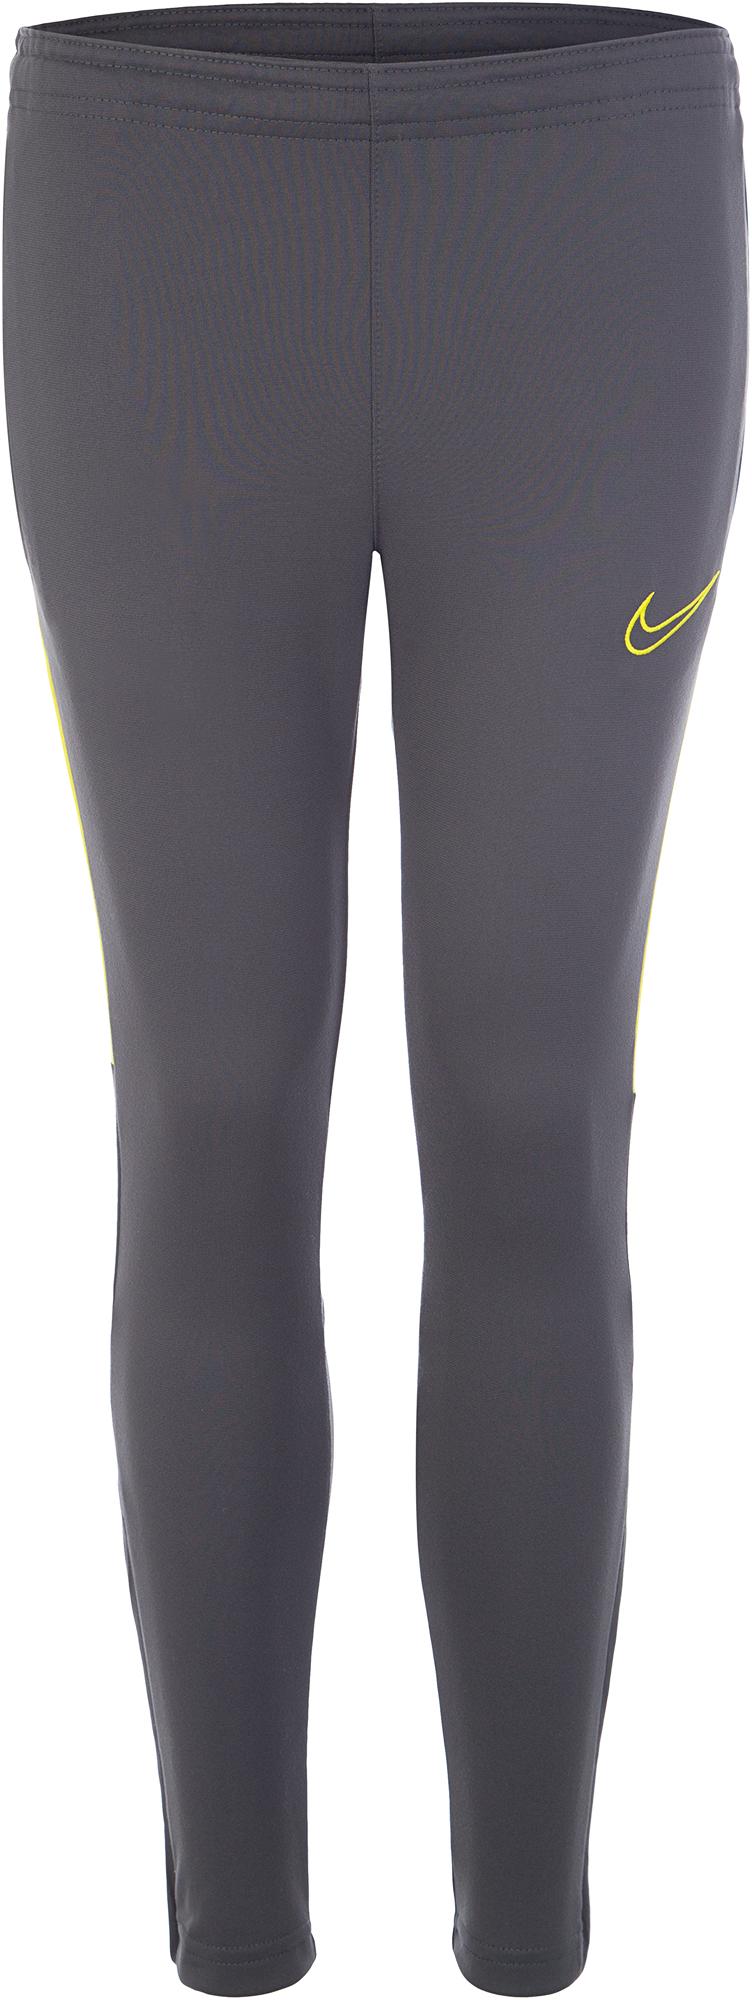 Nike Брюки для мальчиков Nike Academy, размер 158-170